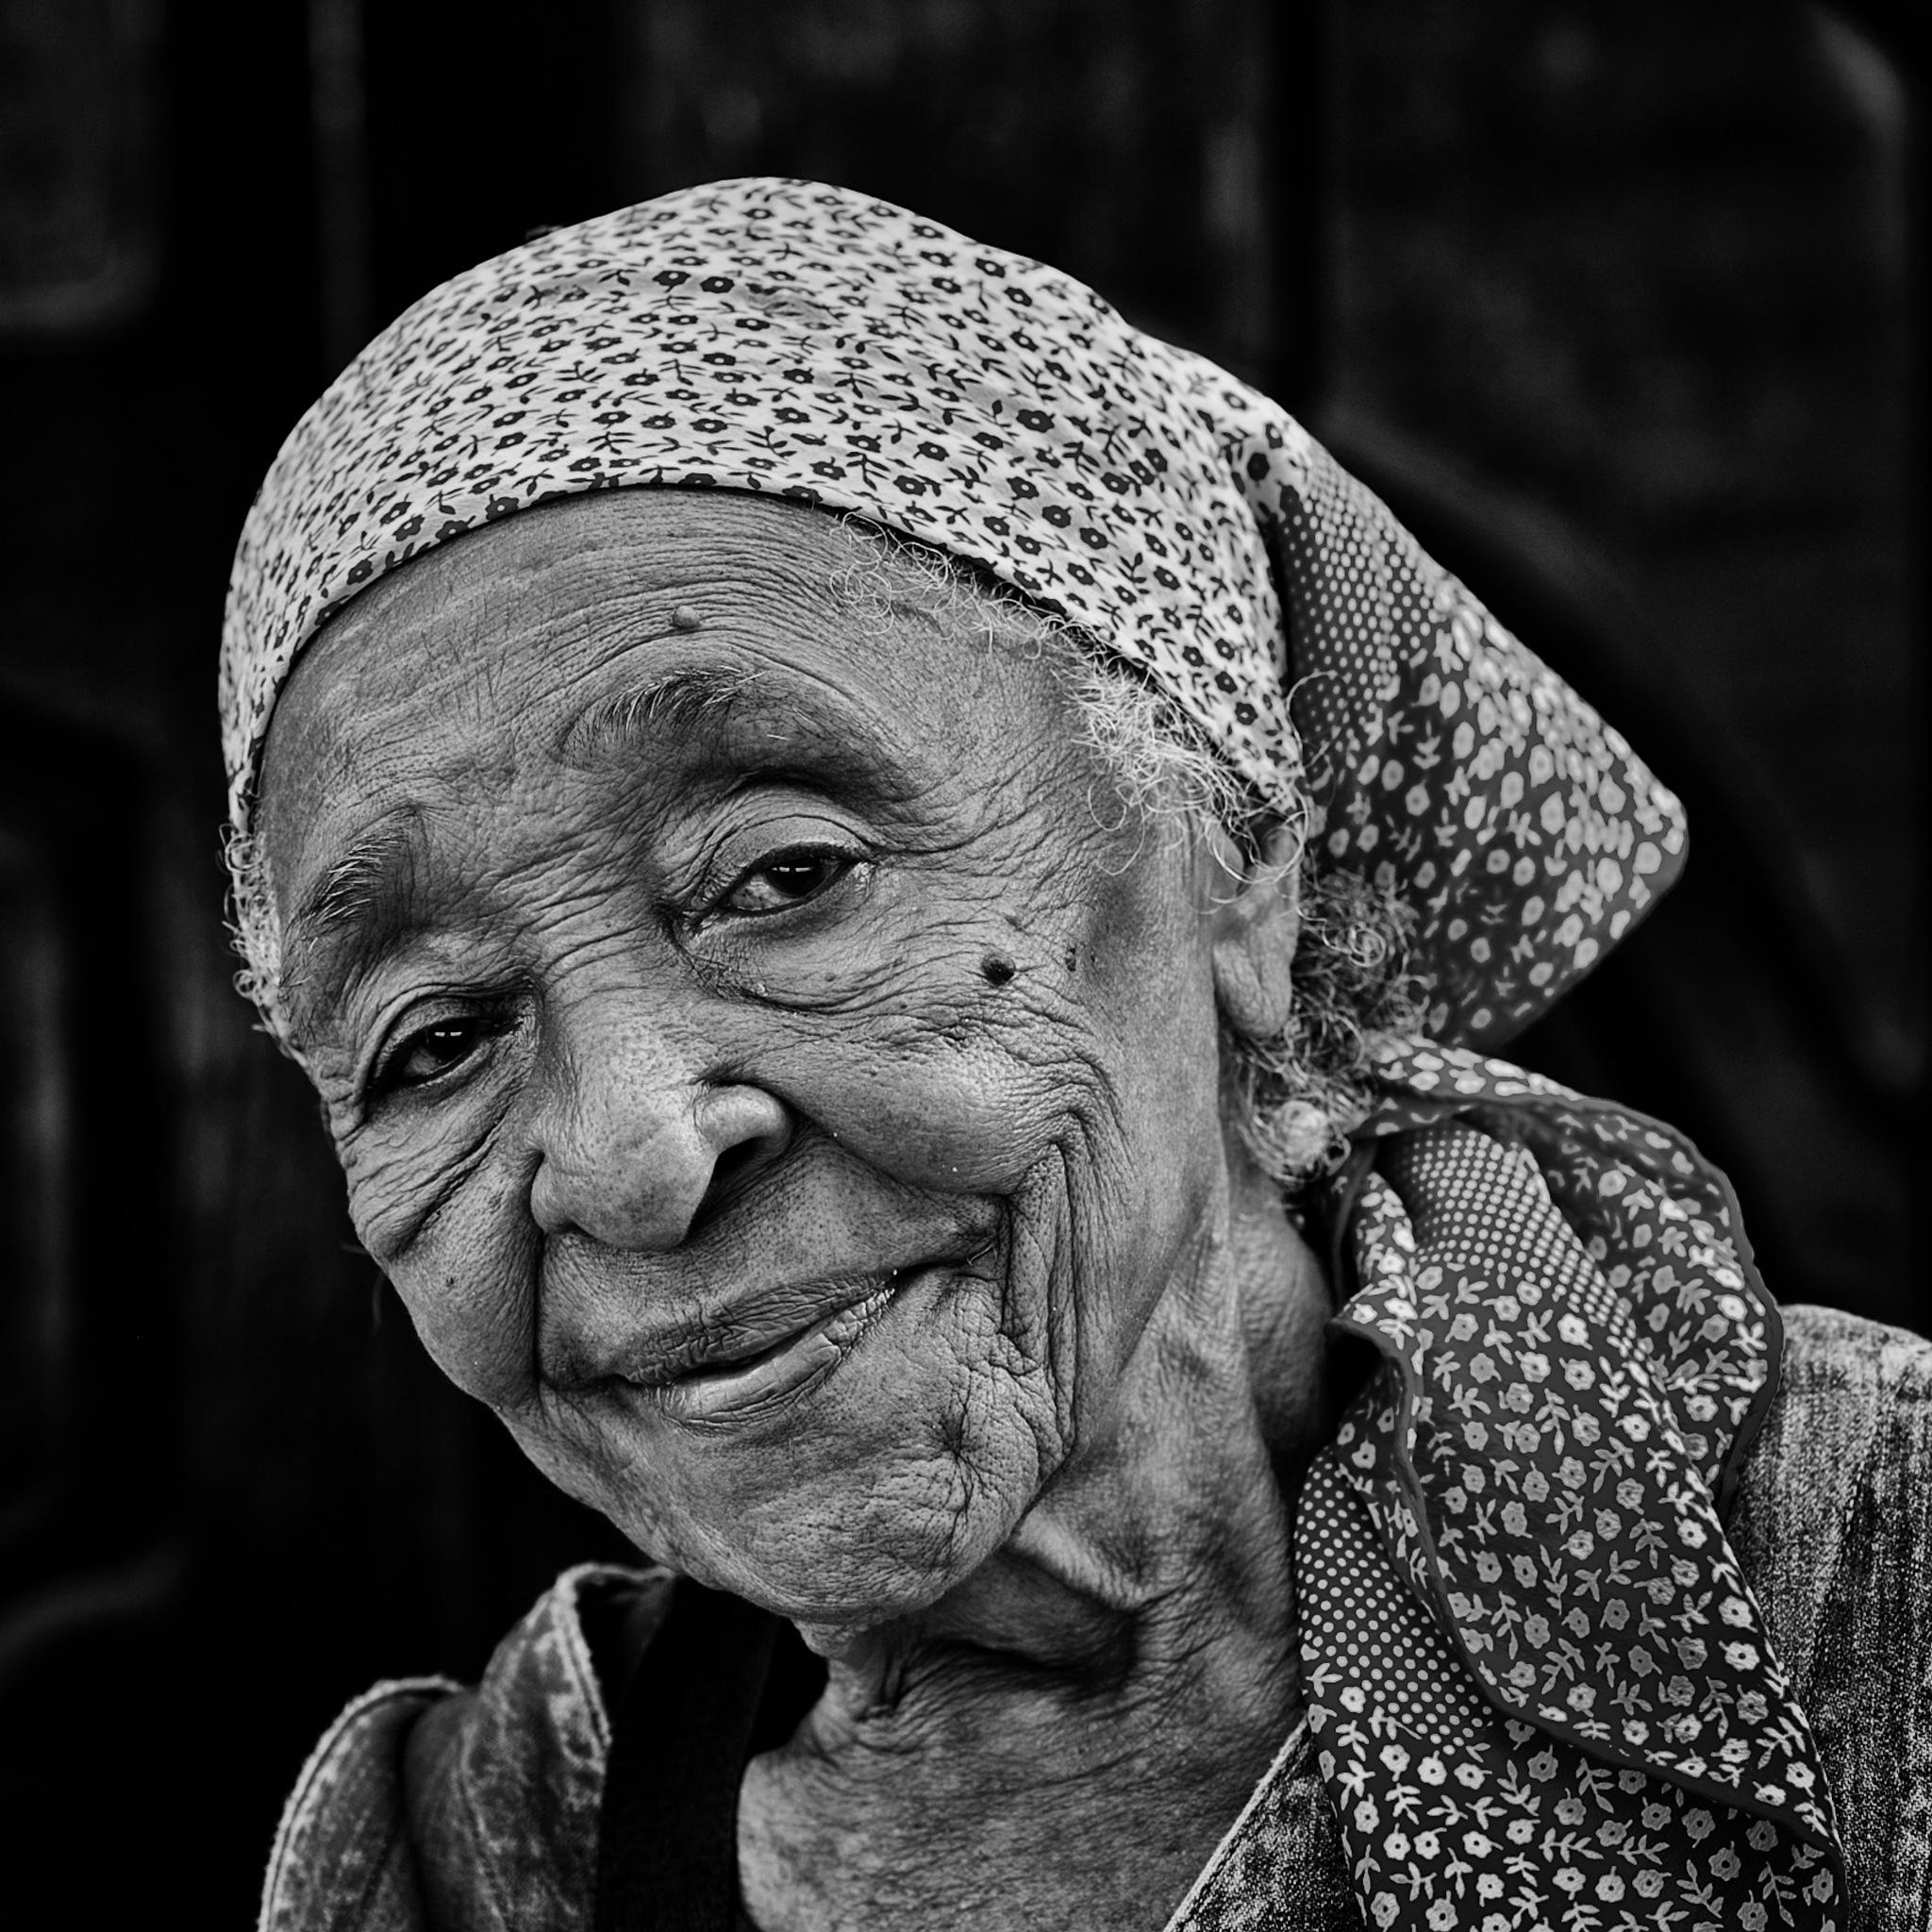 Benign Look by Mahesh Krishnamurthy